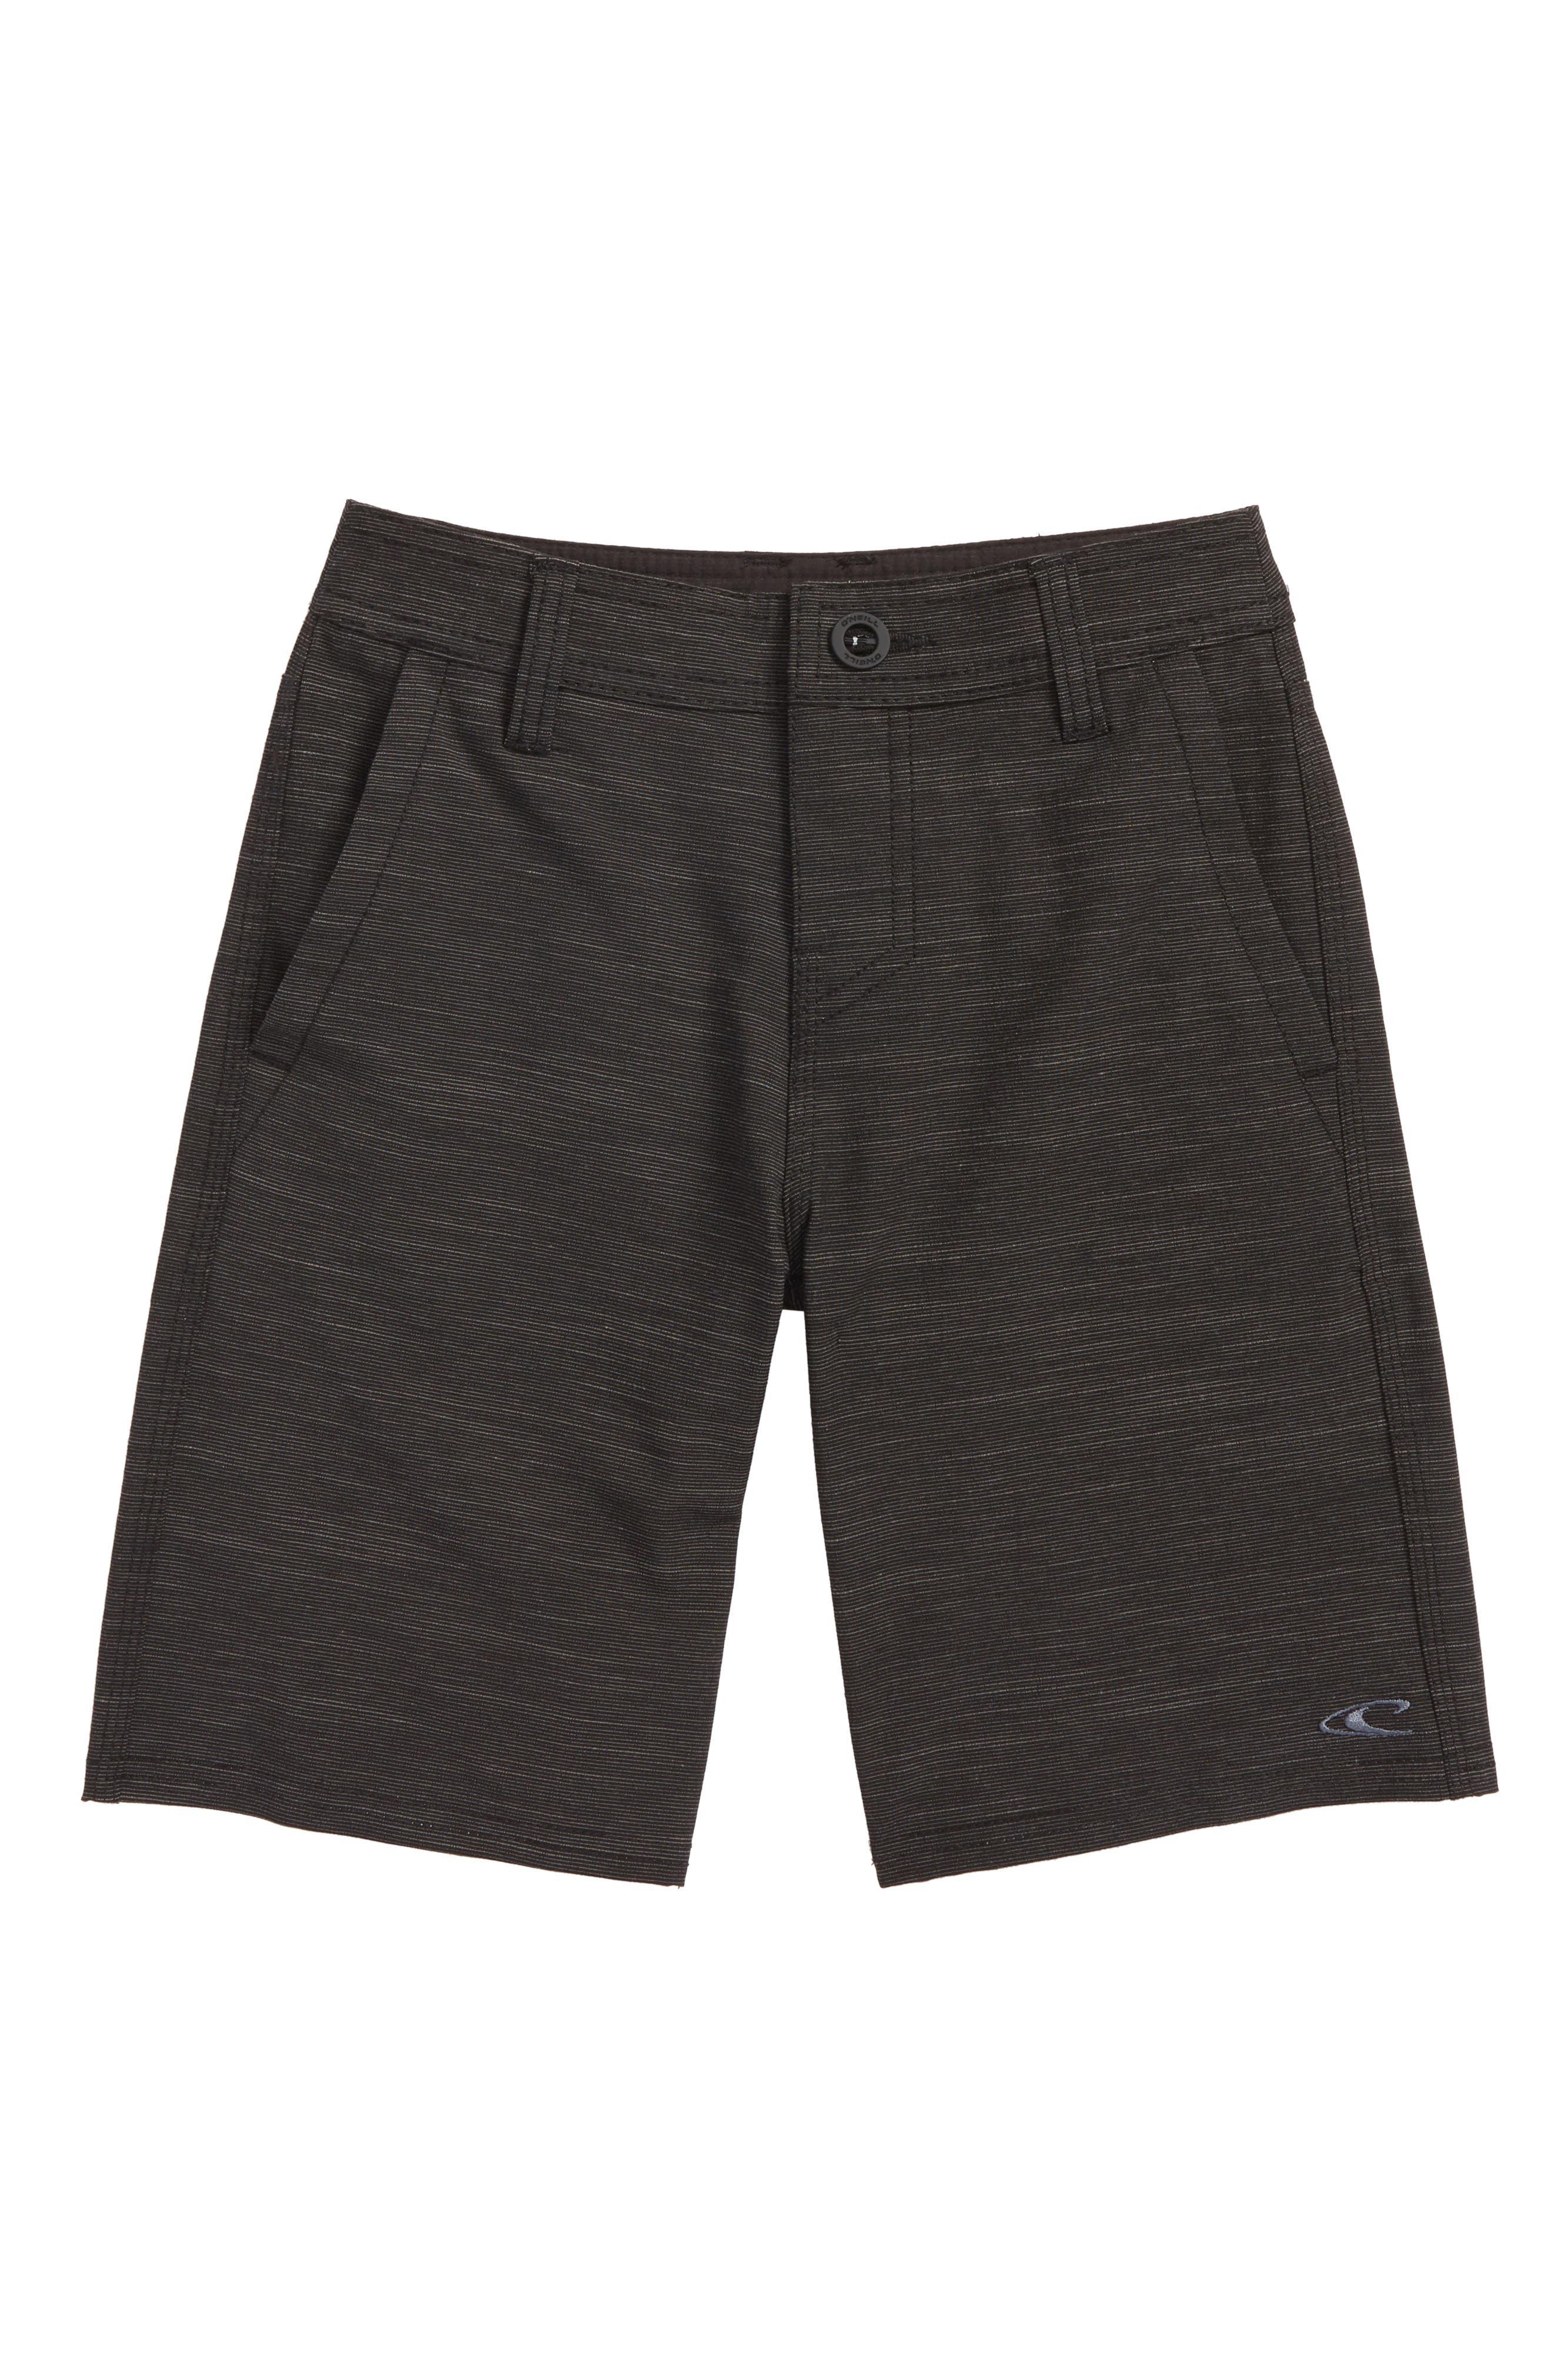 Locked Slub Hybrid Board Shorts,                         Main,                         color, Black